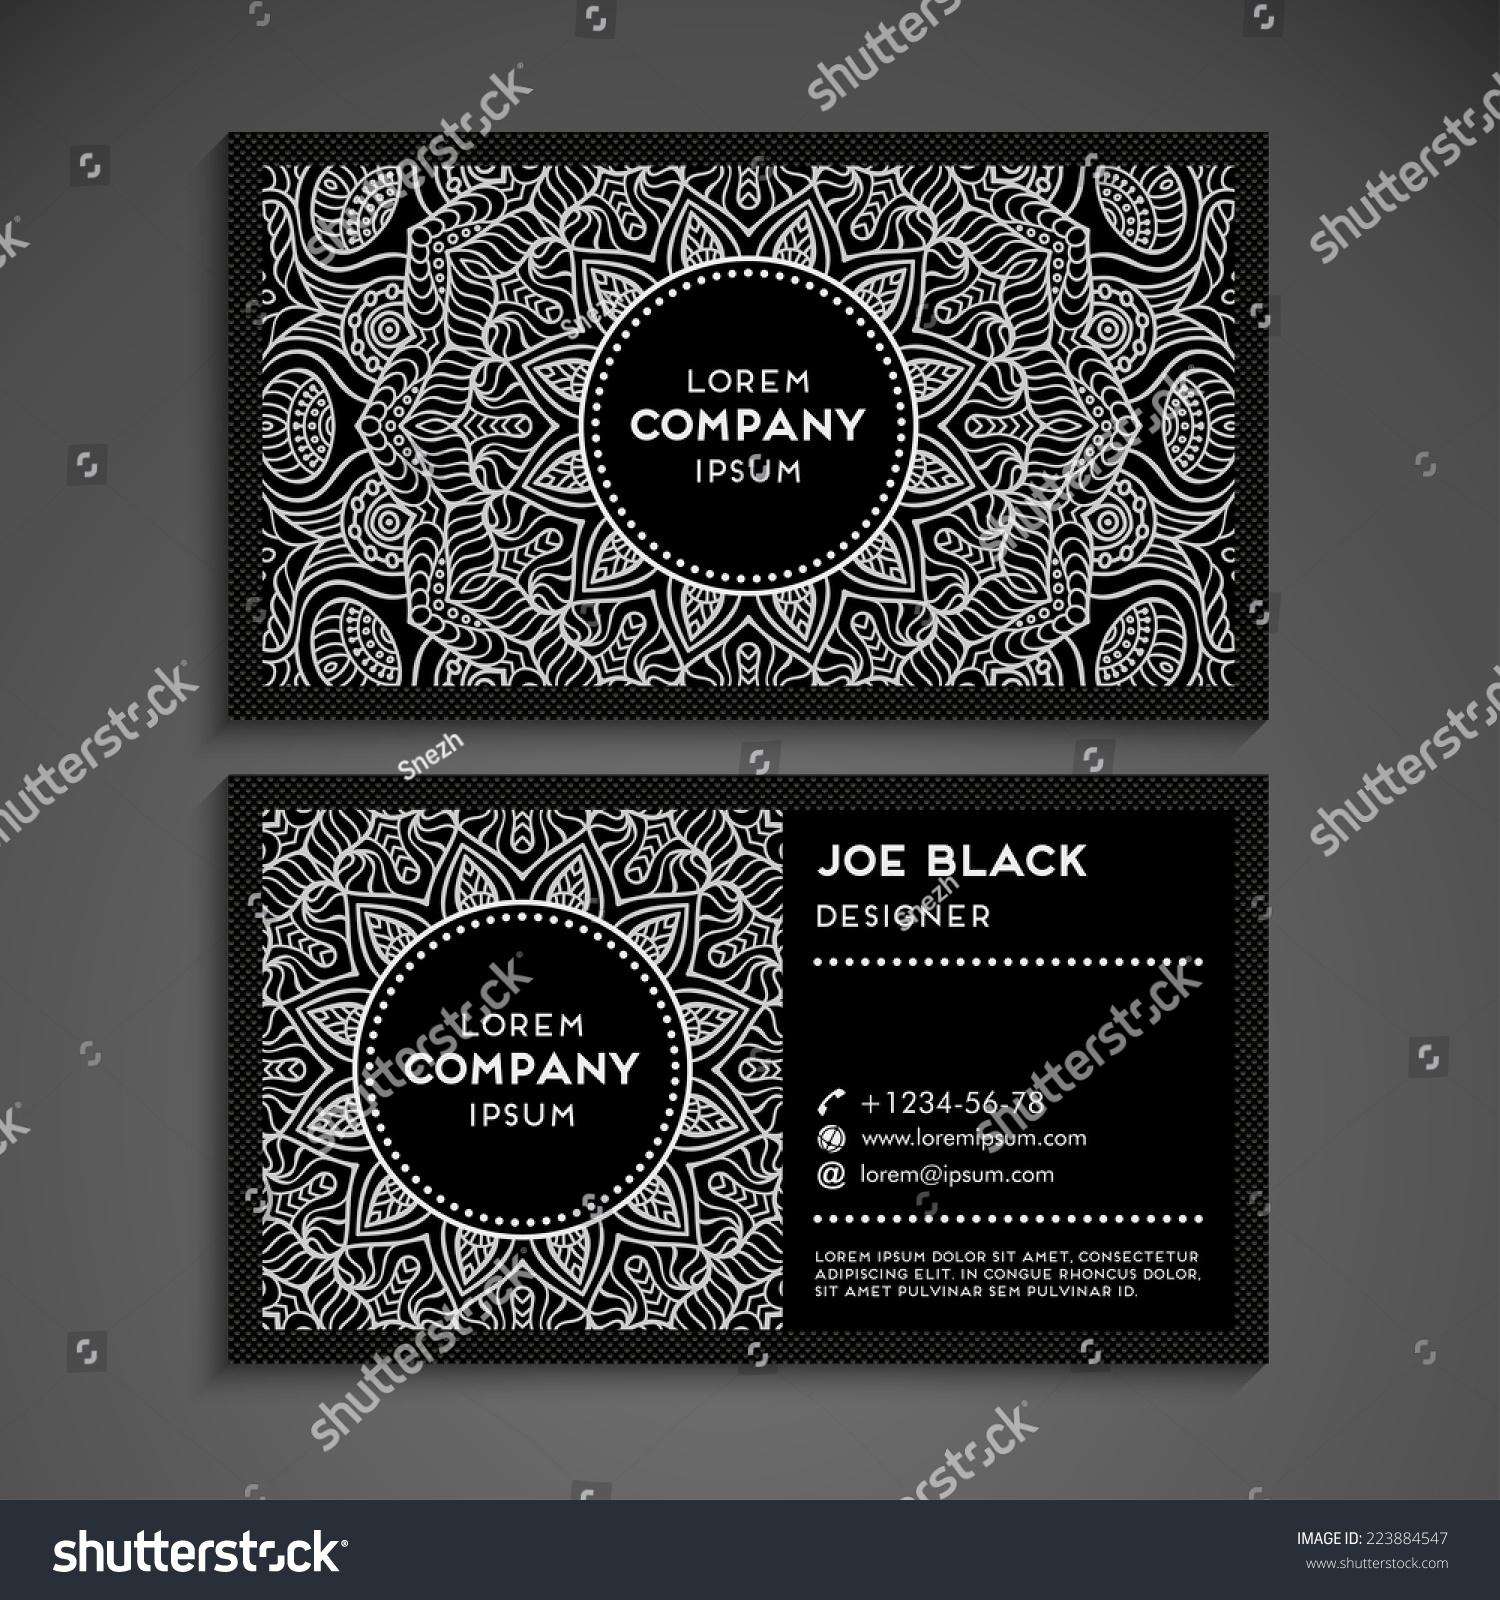 Vintage Business Card Stock Vector (2018) 223884547 - Shutterstock